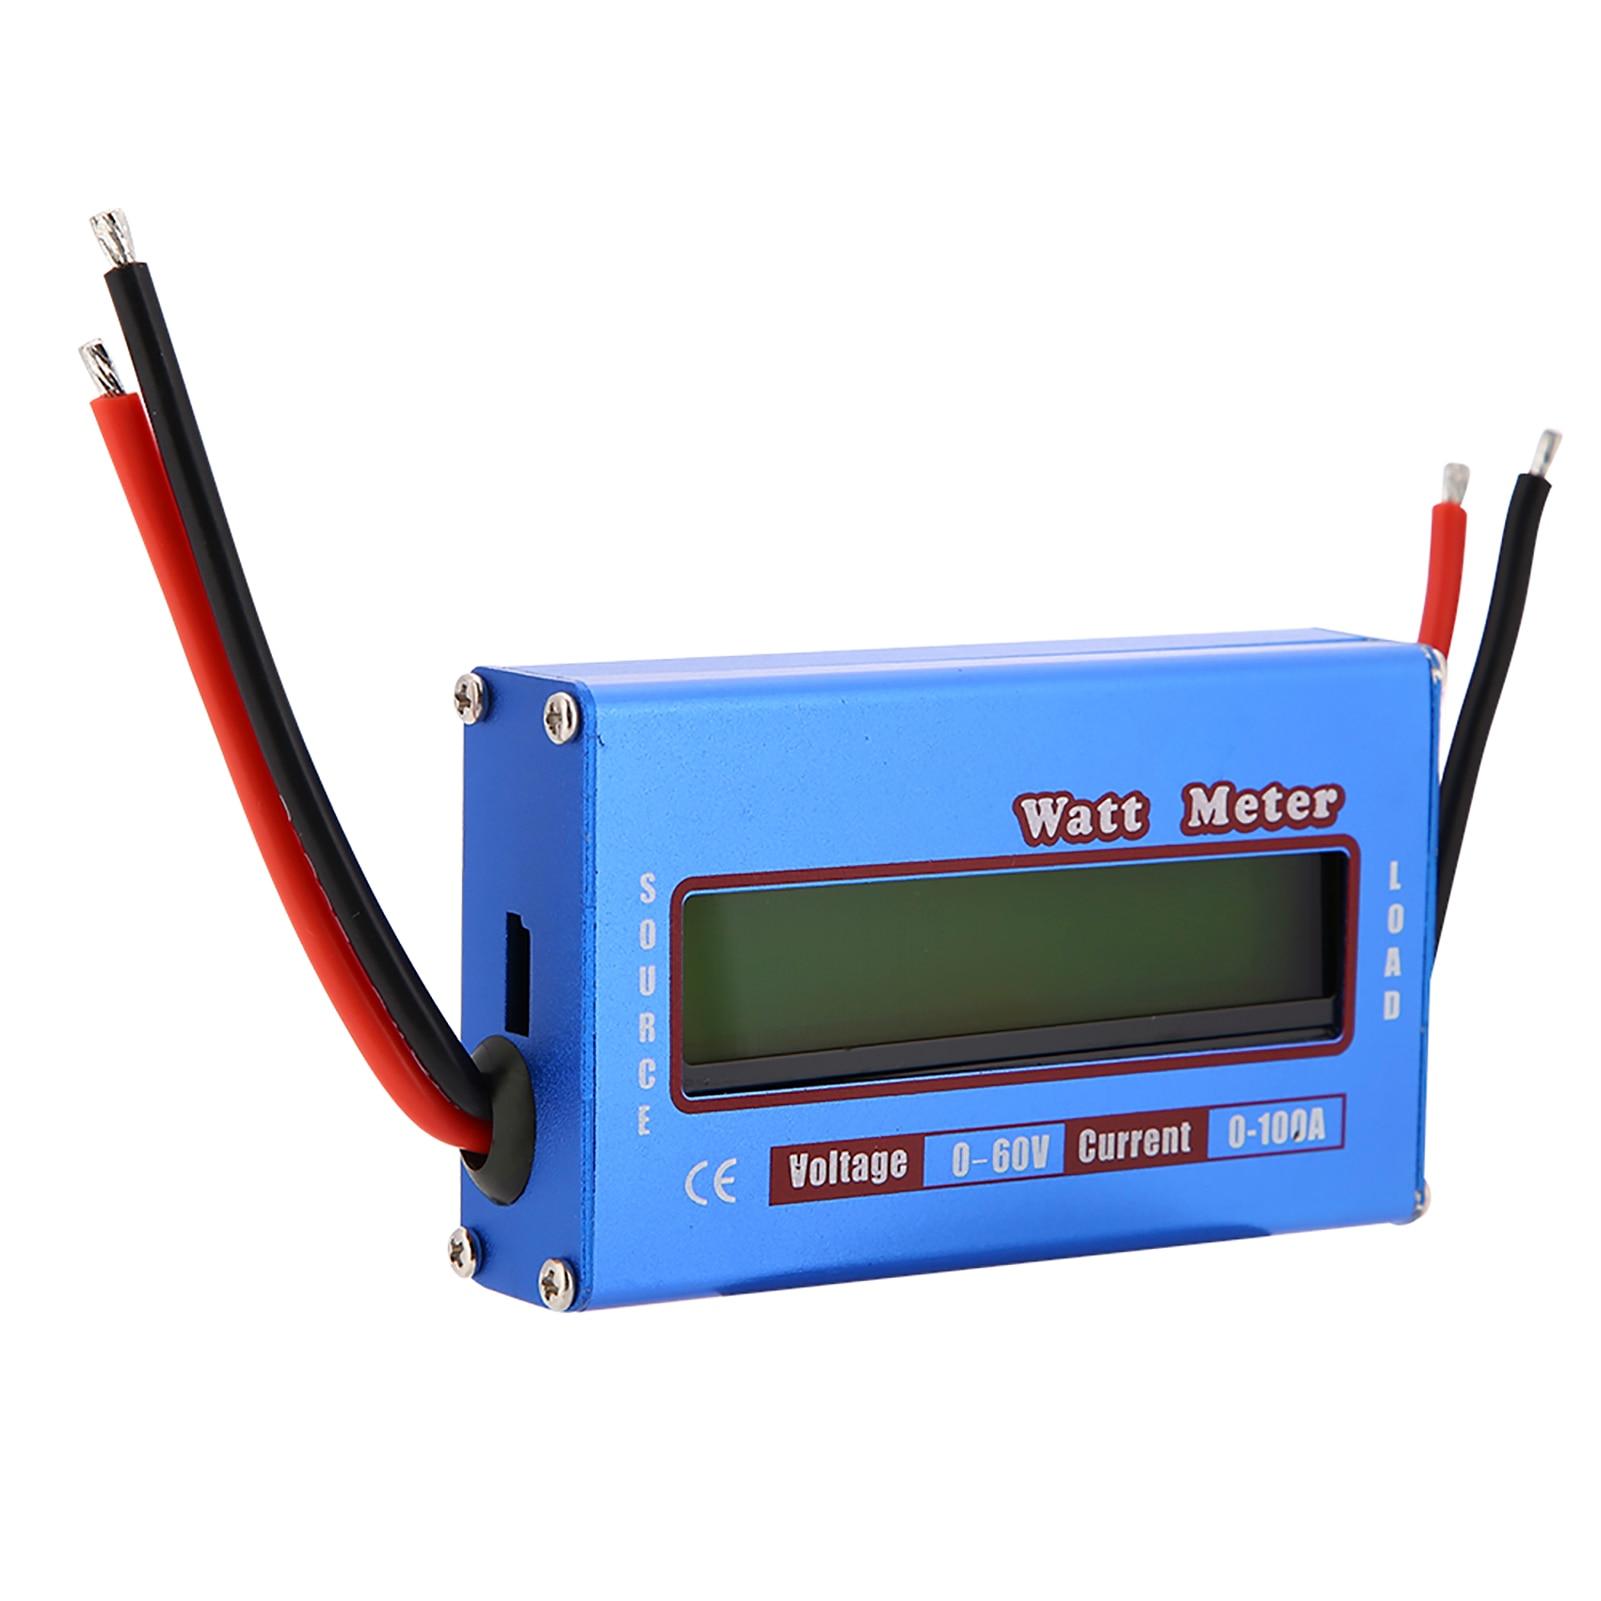 RC Digital Wattmeter Watt Meter Checker Medidor De Energia DC 60 v 100A Analisador De Potência Tensão Equilíbrio Bateria